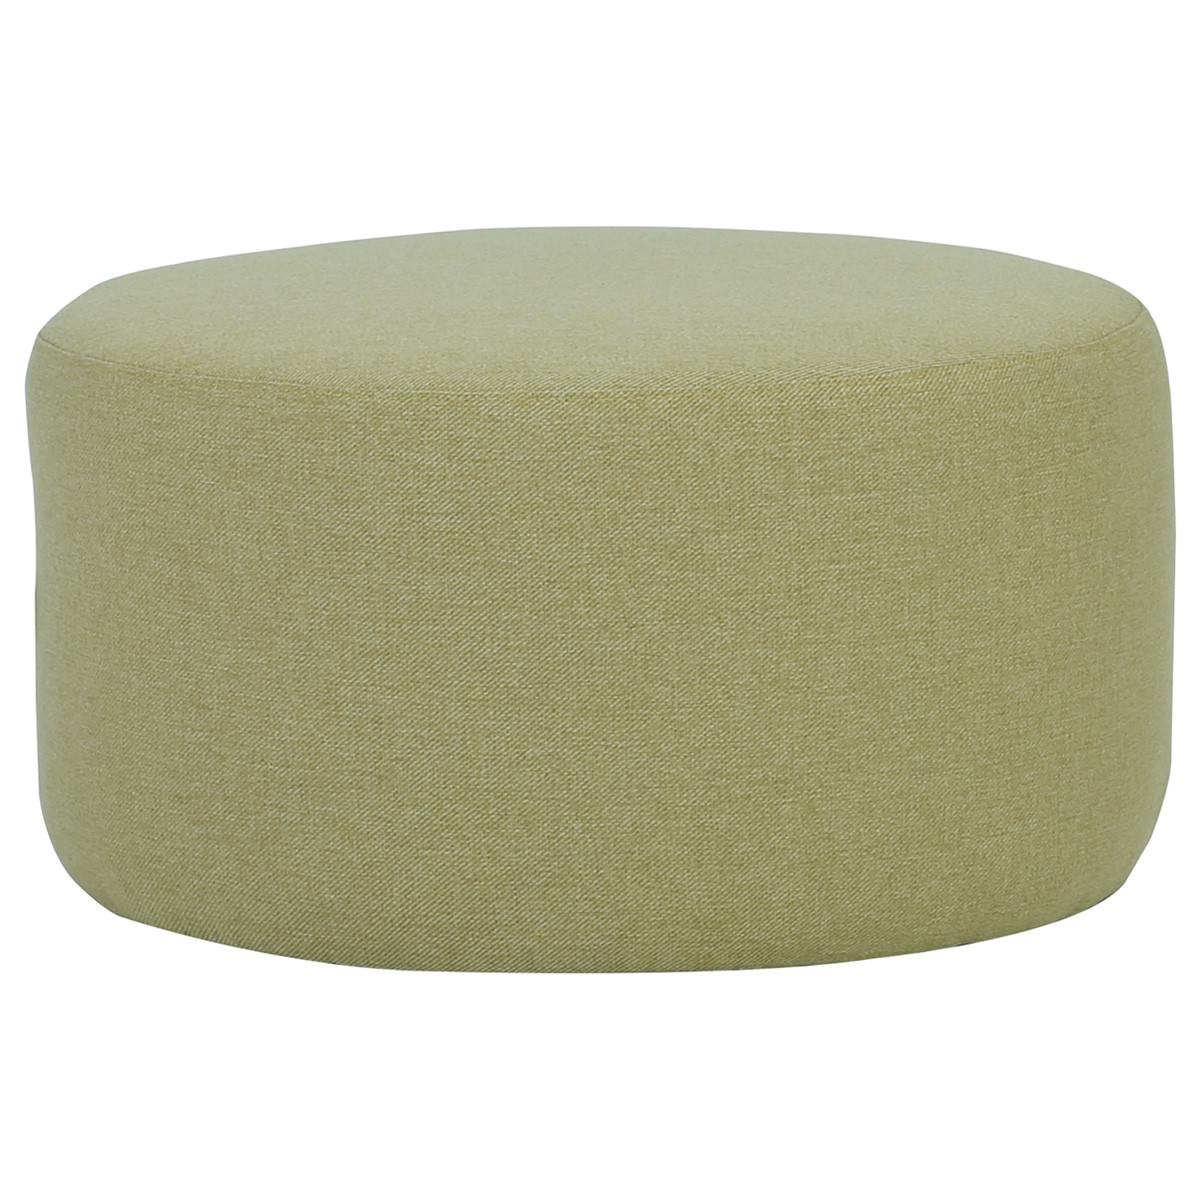 Omni Fabric Round Ottoman, 62cm, Green